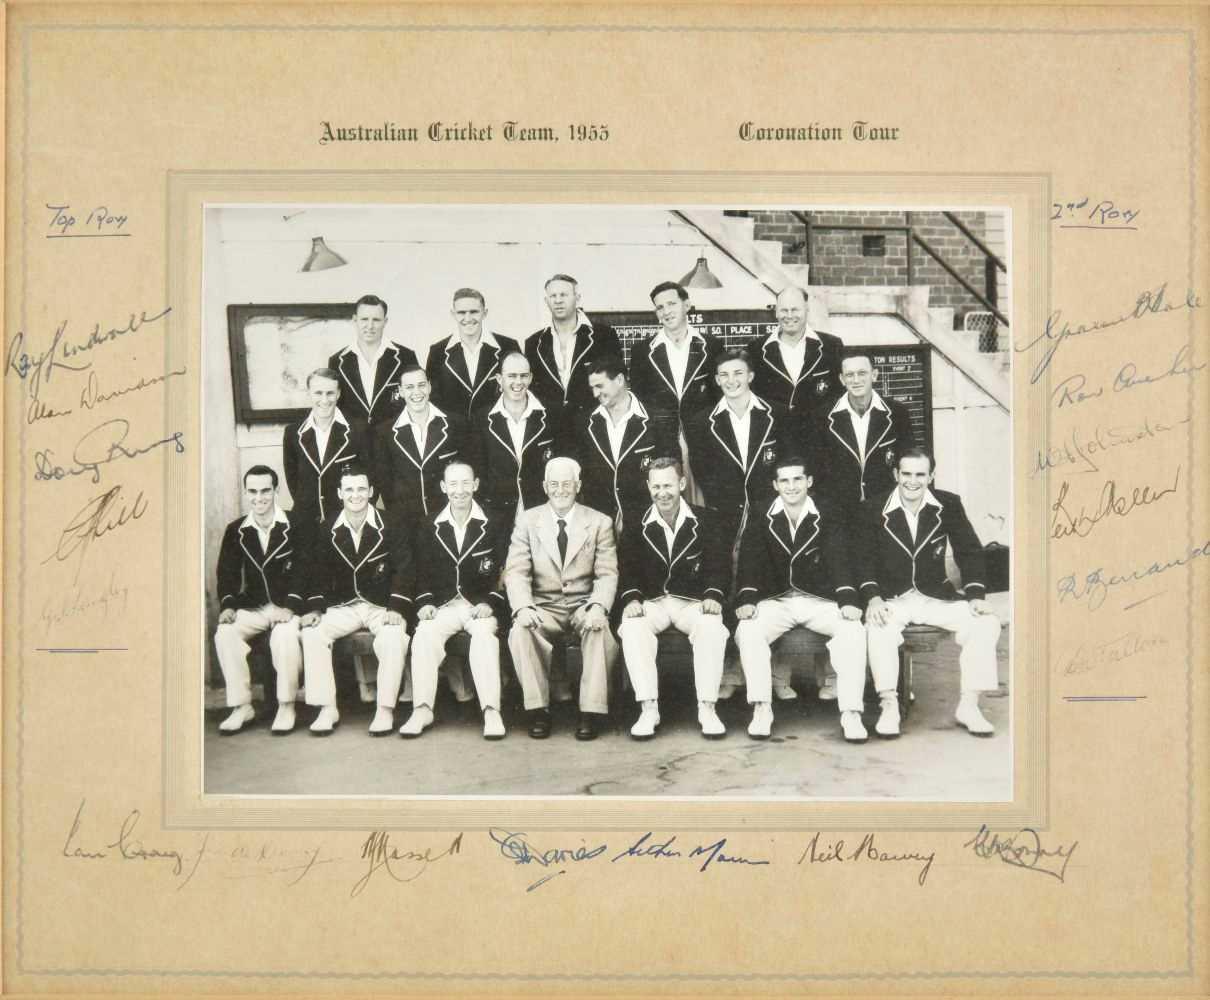 Cricket. Australian Cricket Team 1953 Coronation Tour signed photograph